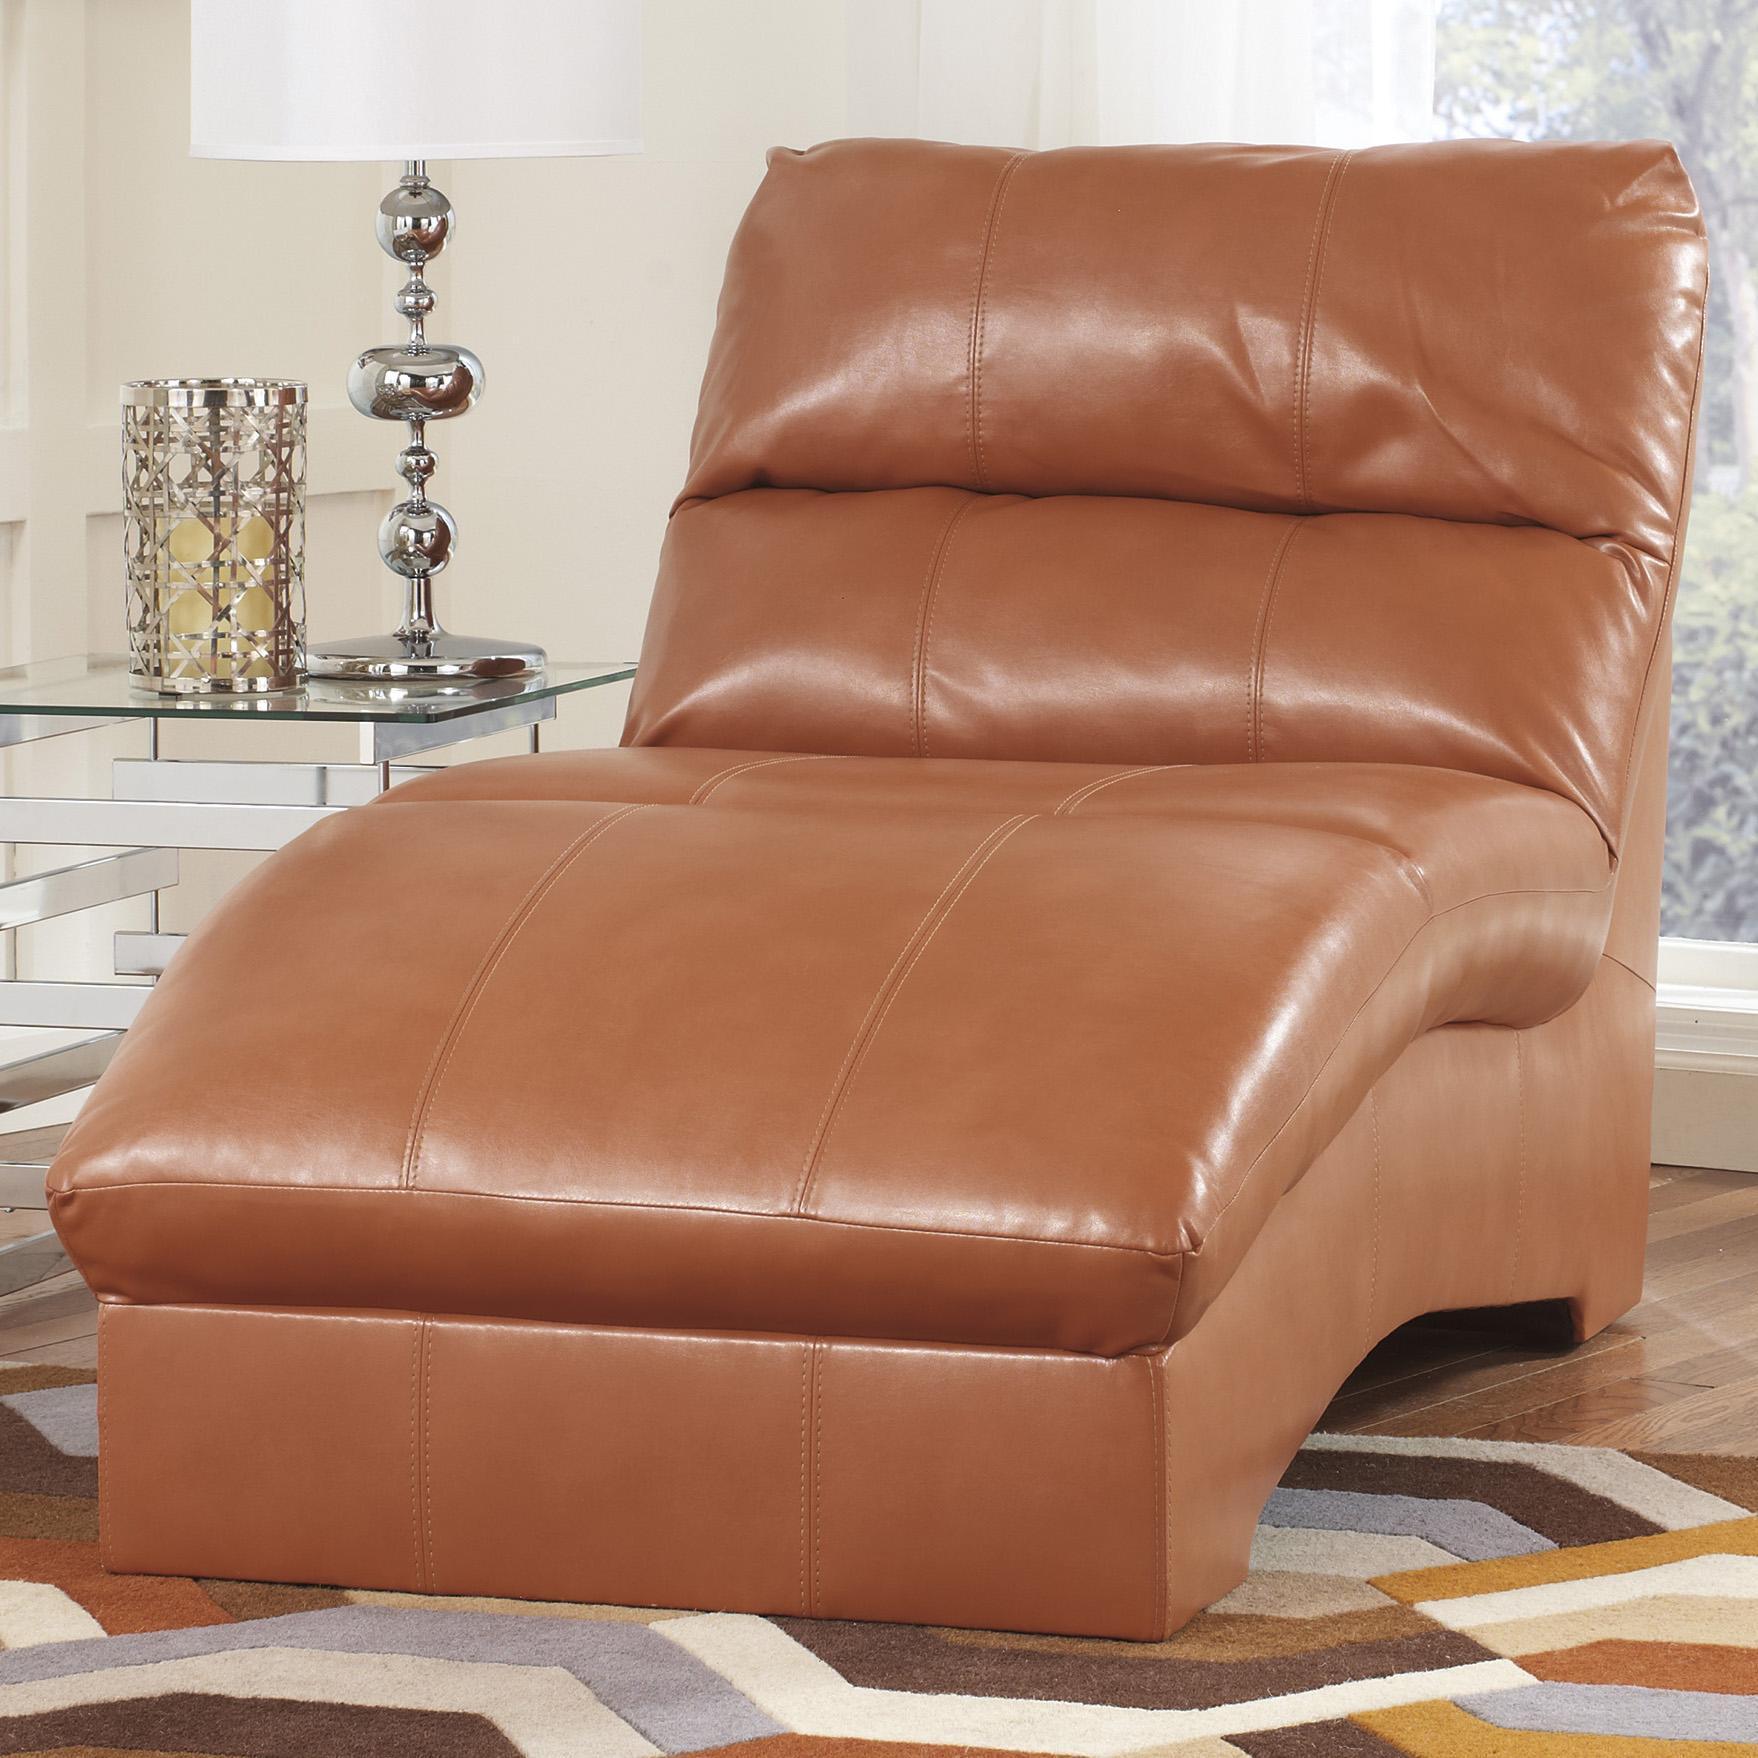 Benchcraft Paulie DuraBlend® - Orange Chaise - Item Number: 2700215